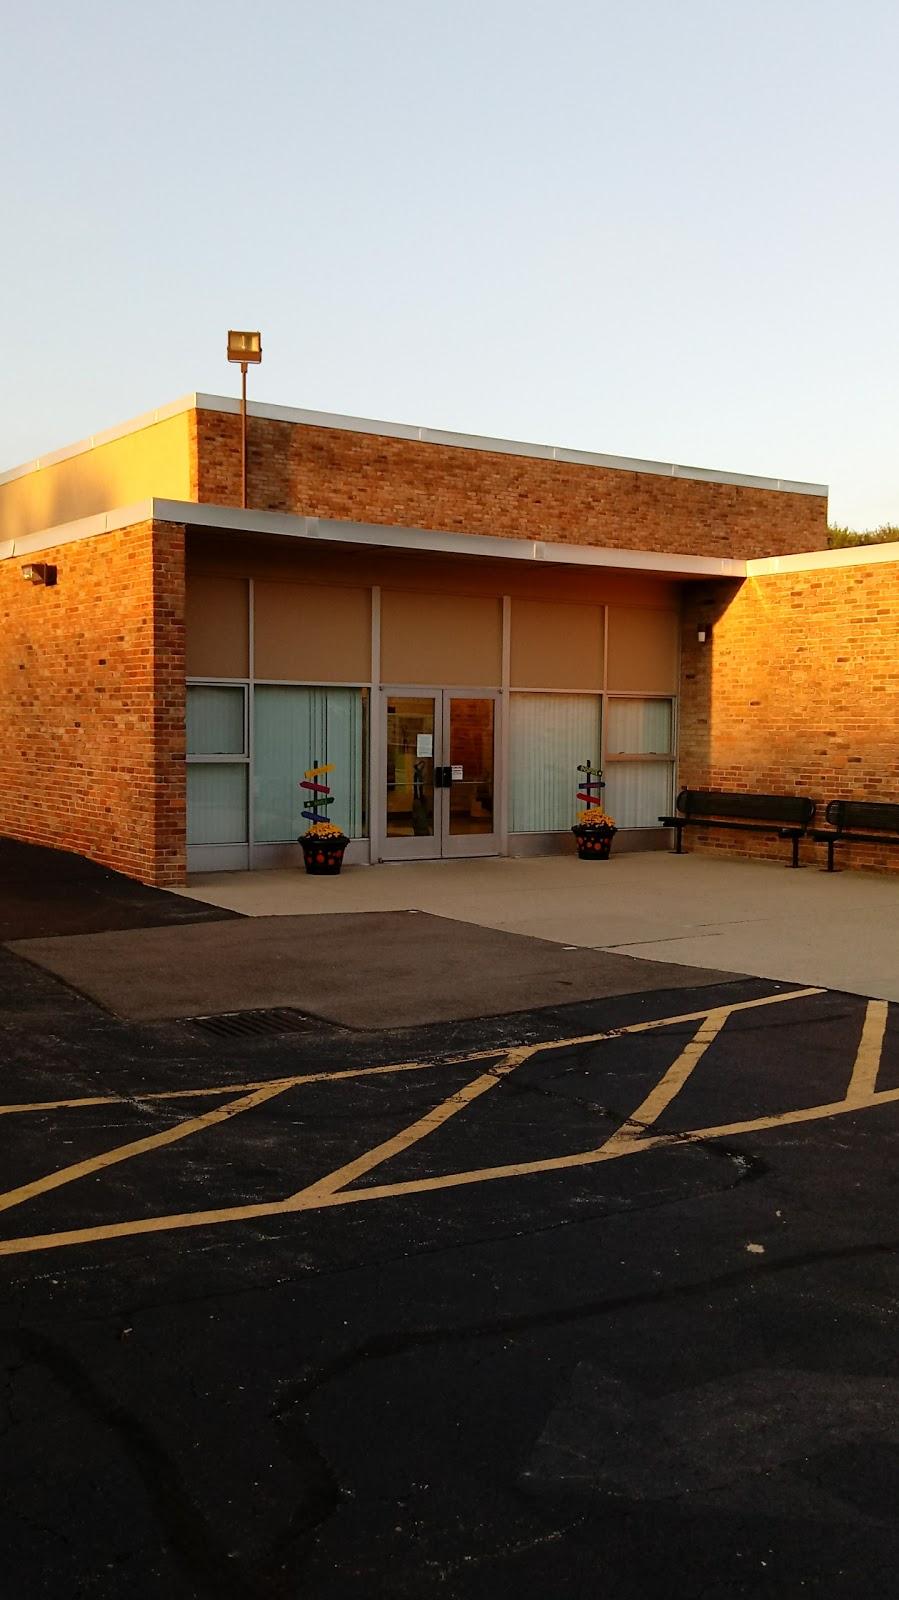 Summerside Elementary School - school    Photo 1 of 10   Address: 4639 Vermona Dr, Cincinnati, OH 45245, USA   Phone: (513) 947-7900